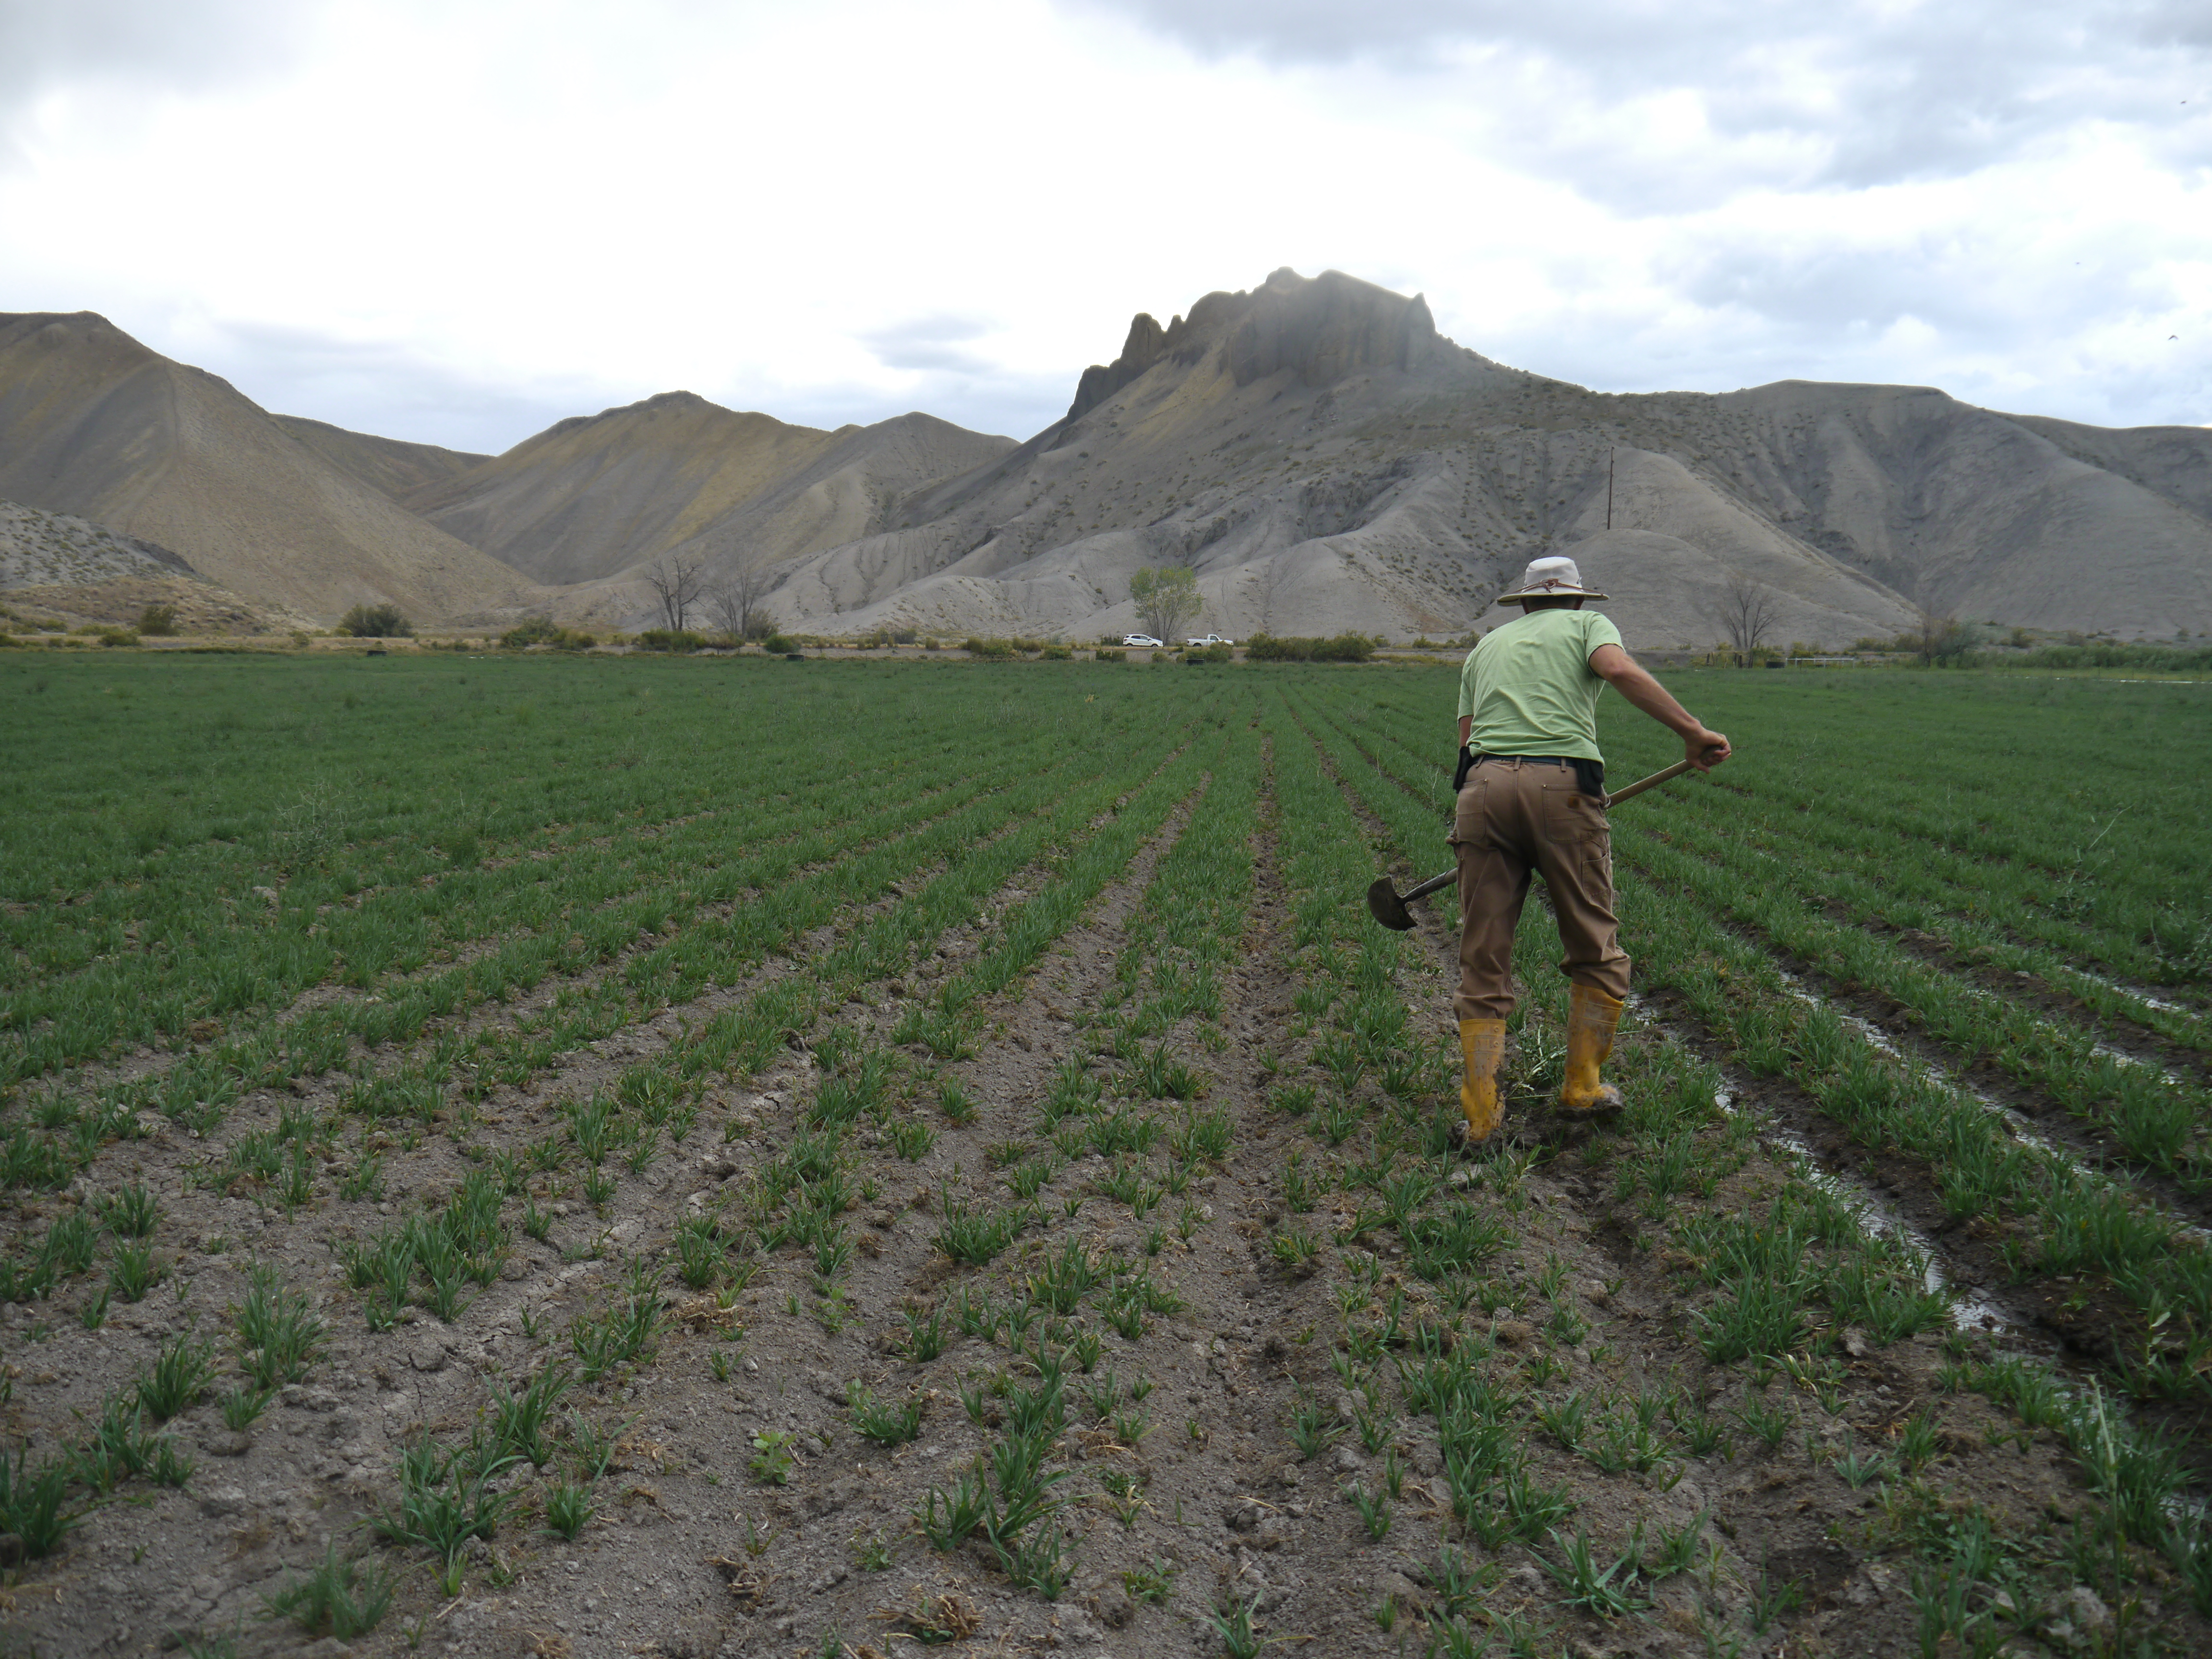 Paul Kehmeier irrigating an oat field on his family farm in Colorado.